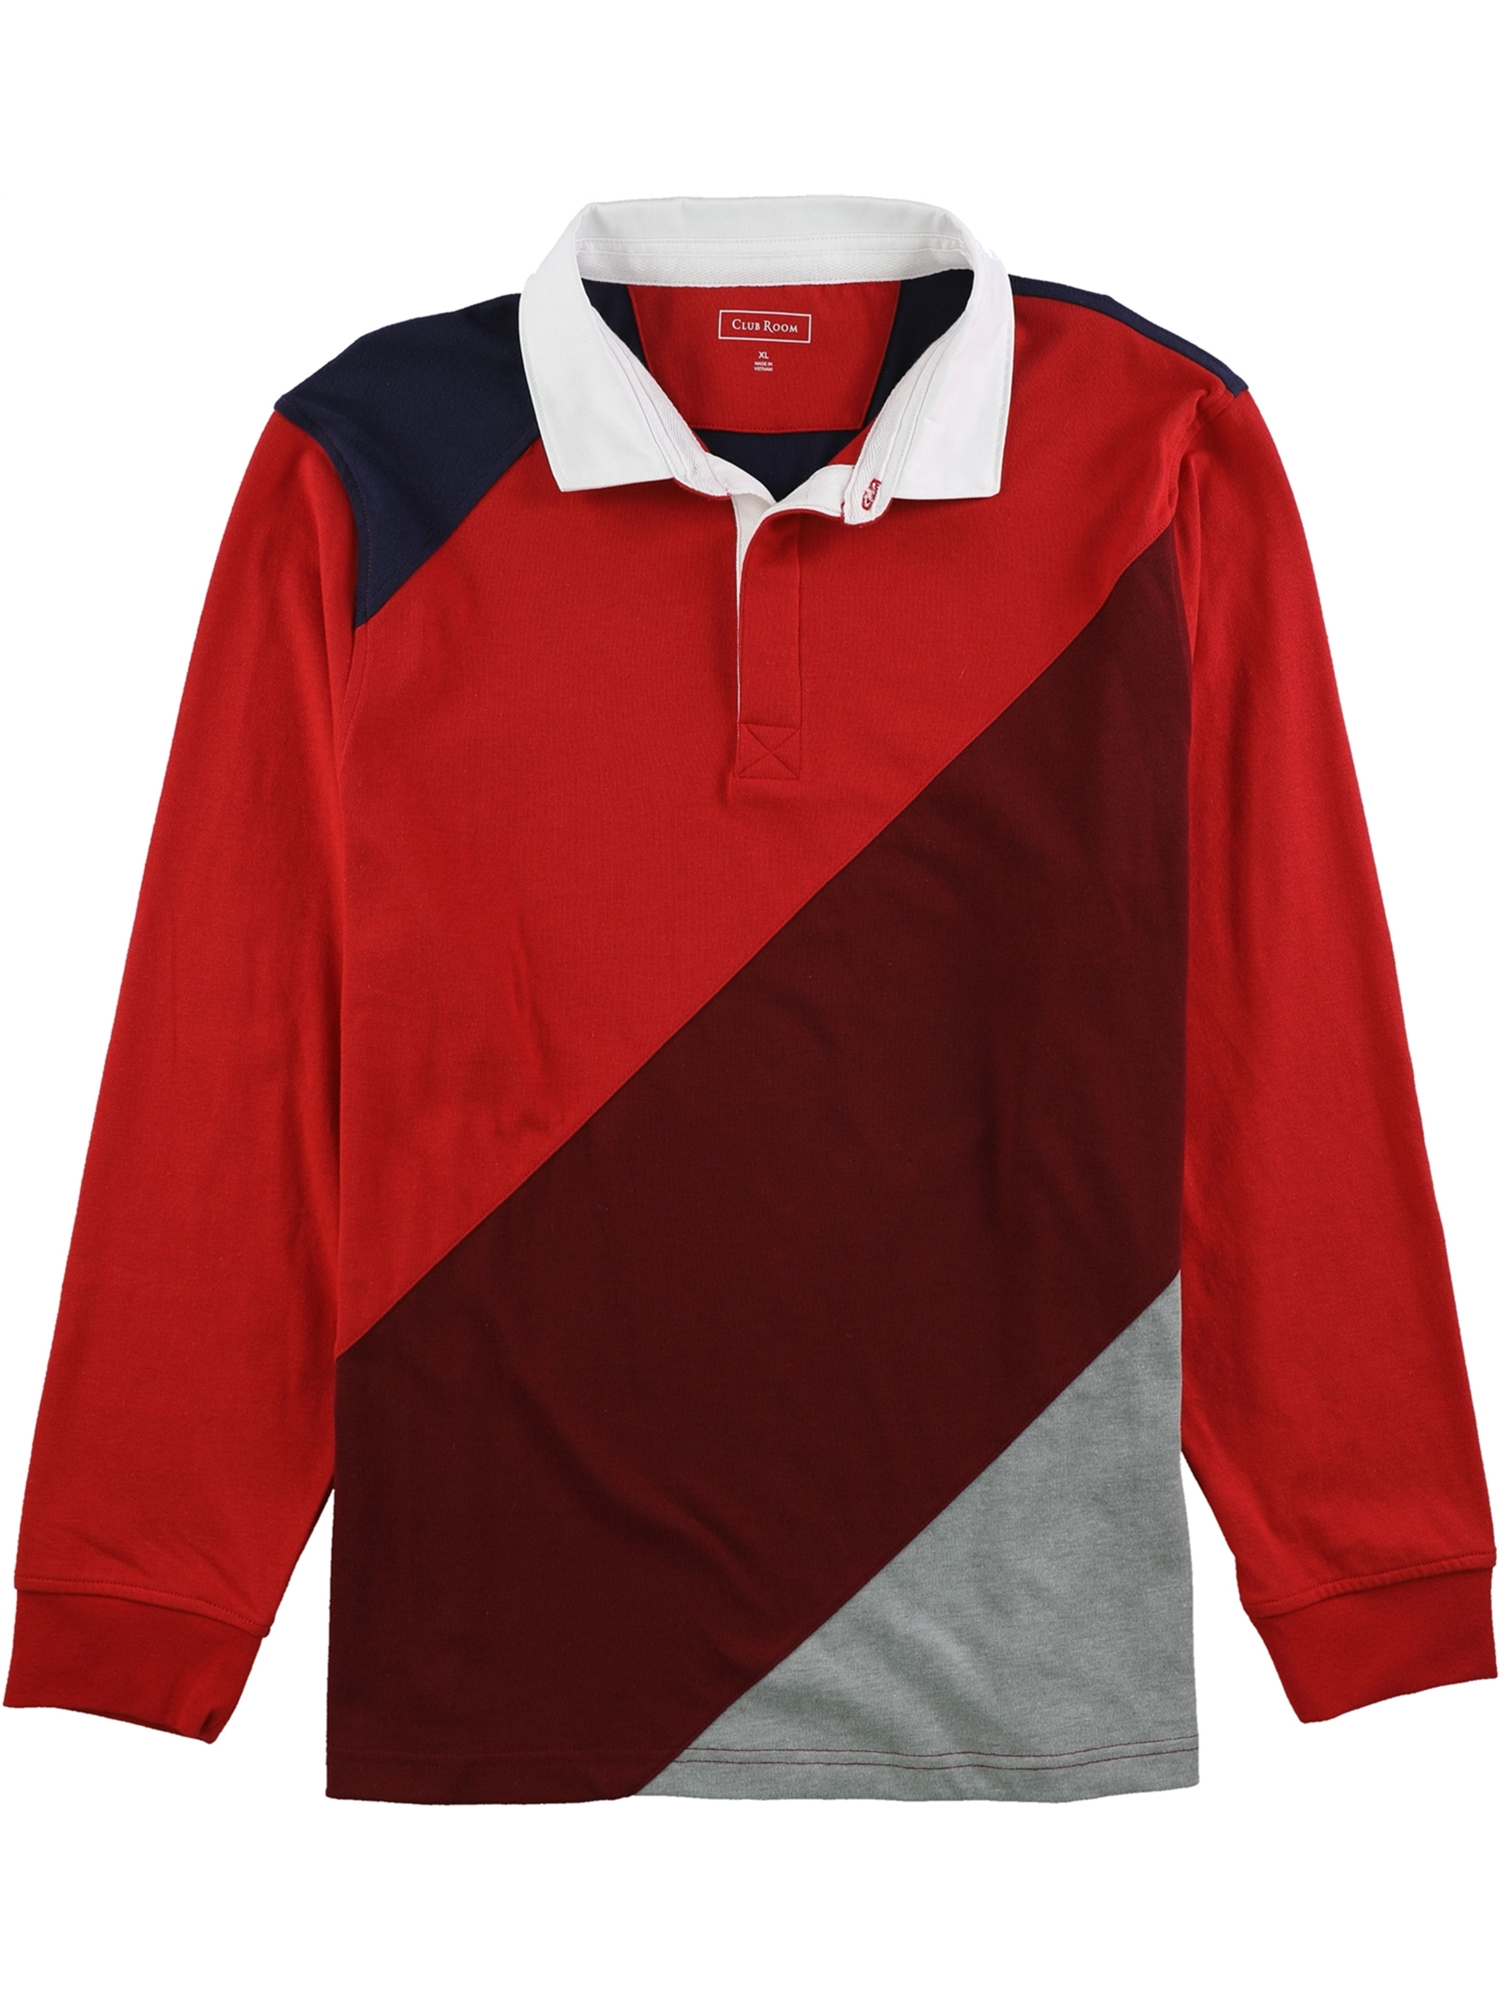 Club Room Mens LS Rugby Polo Shirt